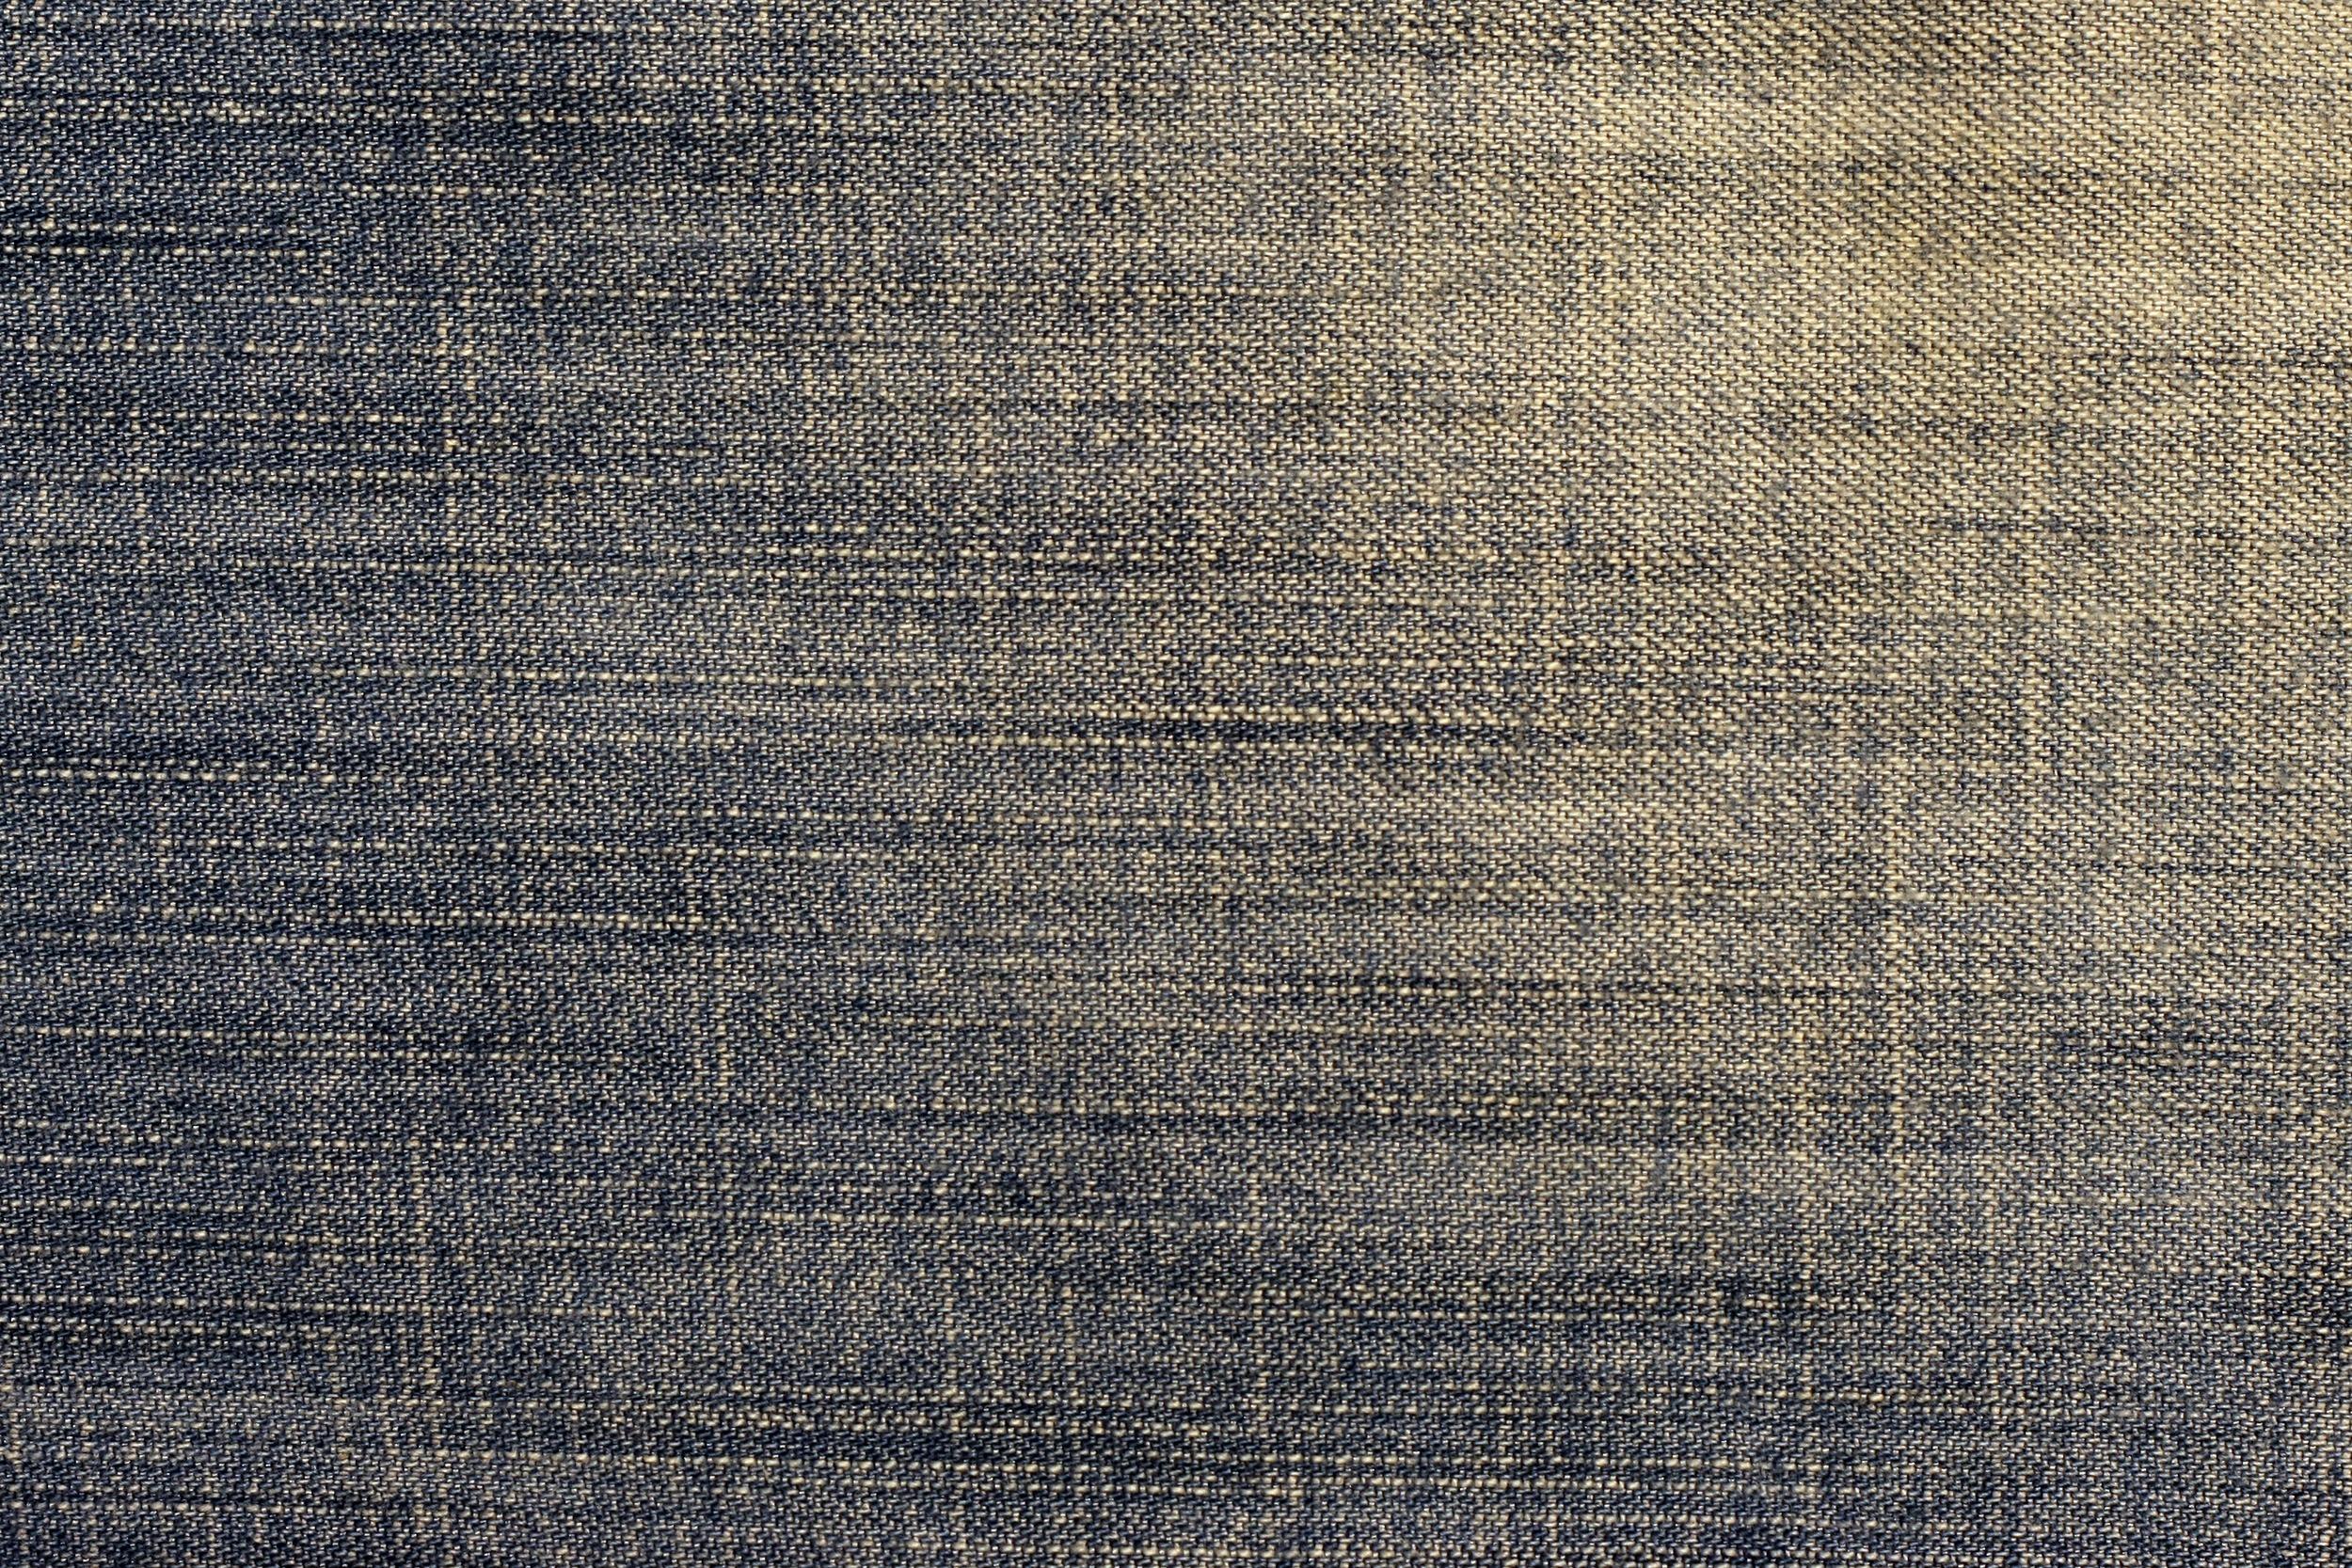 Kostenlose foto : Jahrgang, Retro, Textur, Stock, Muster, Jeans ...